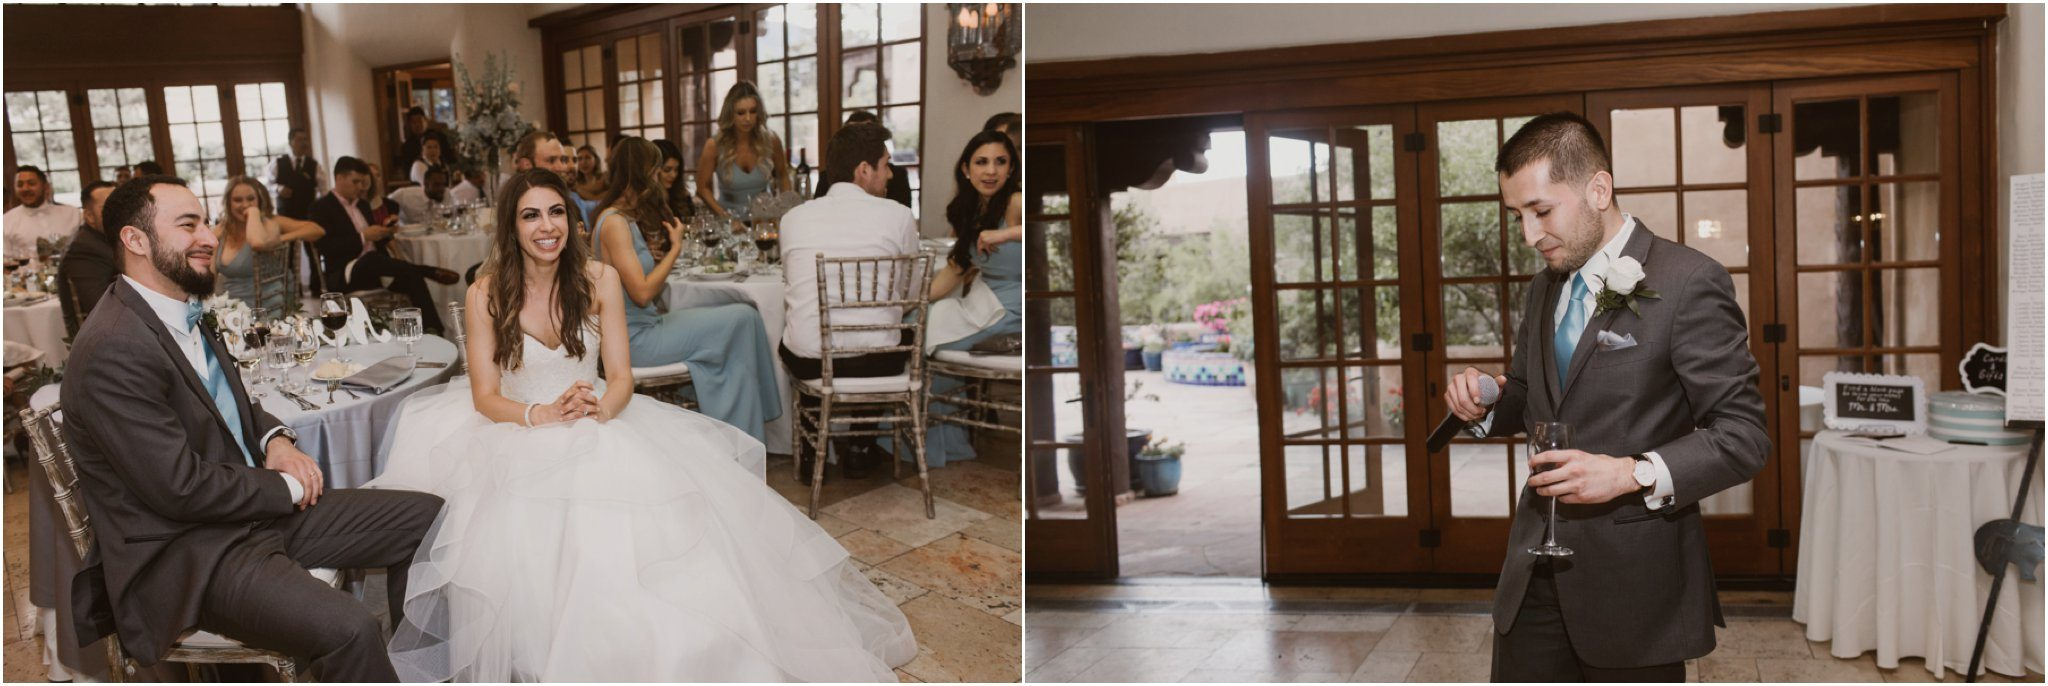 37Blue Rose Photography_ Albuquerque_ Santa Fe_ New Mexico wedding photographers